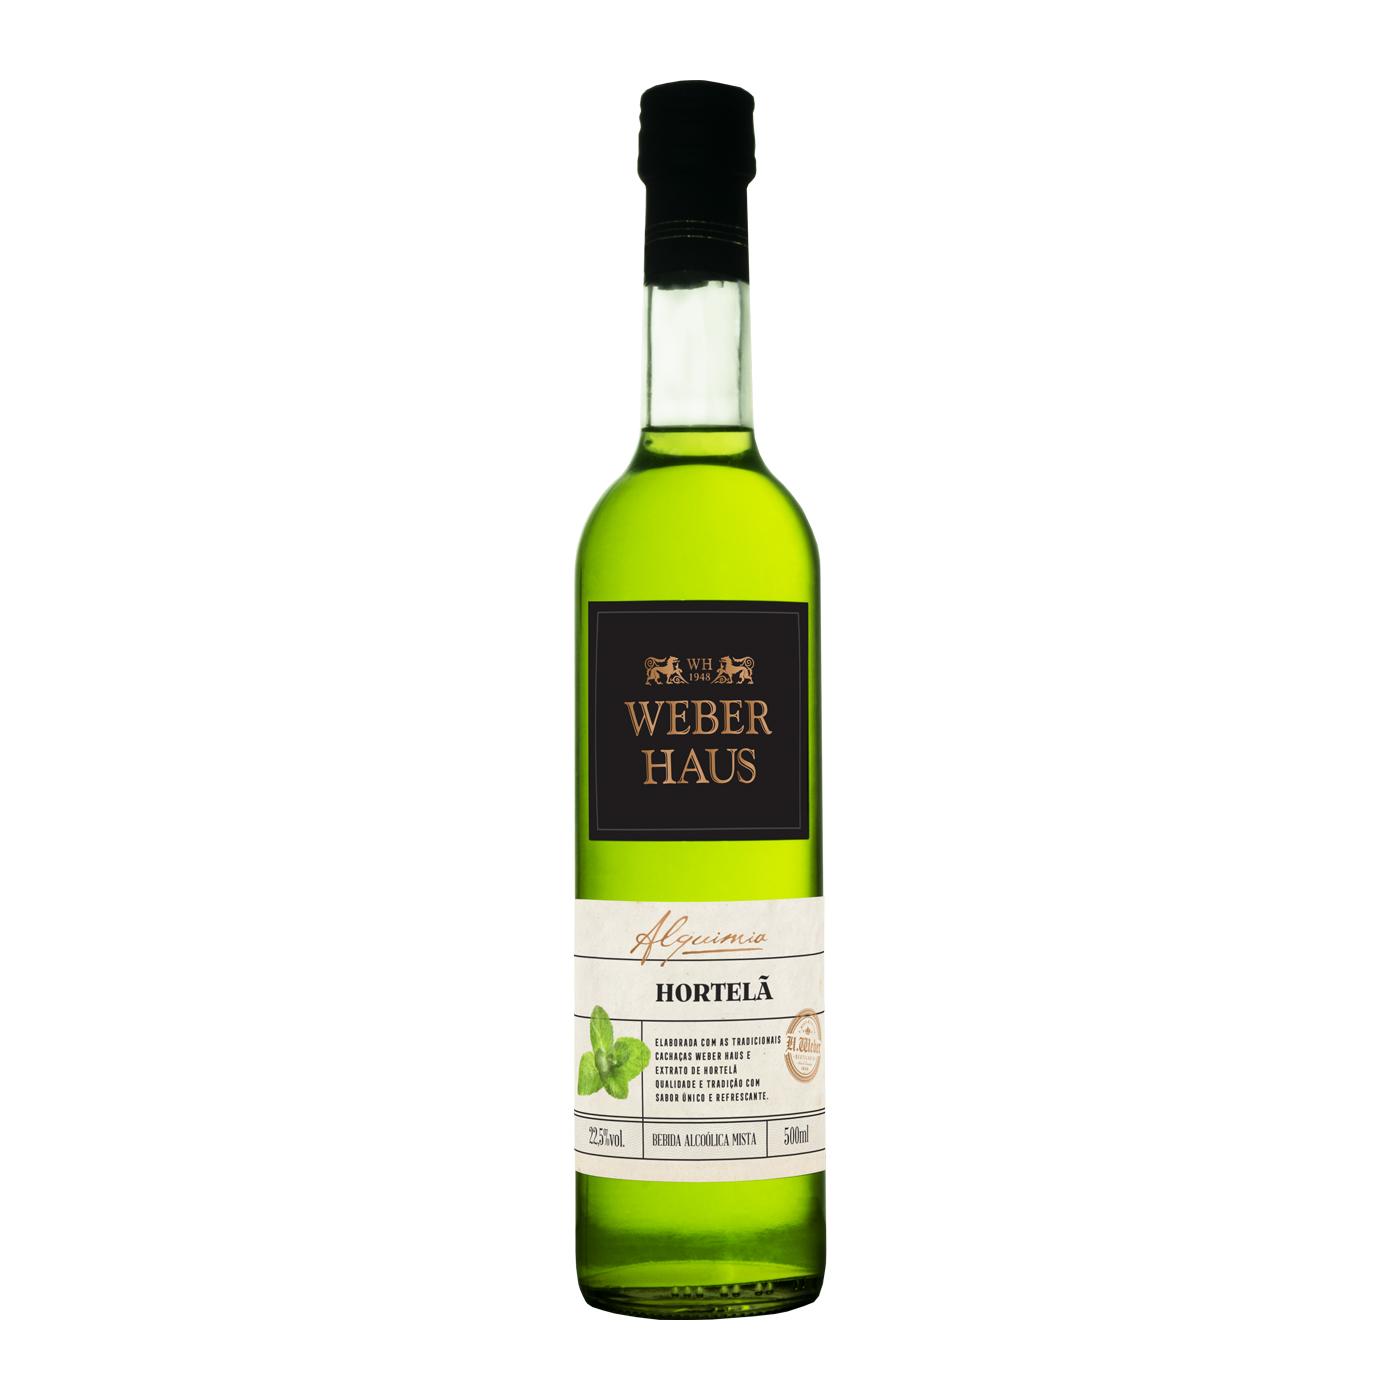 Weber Haus Bebida Mista de Hortelã - 500ml